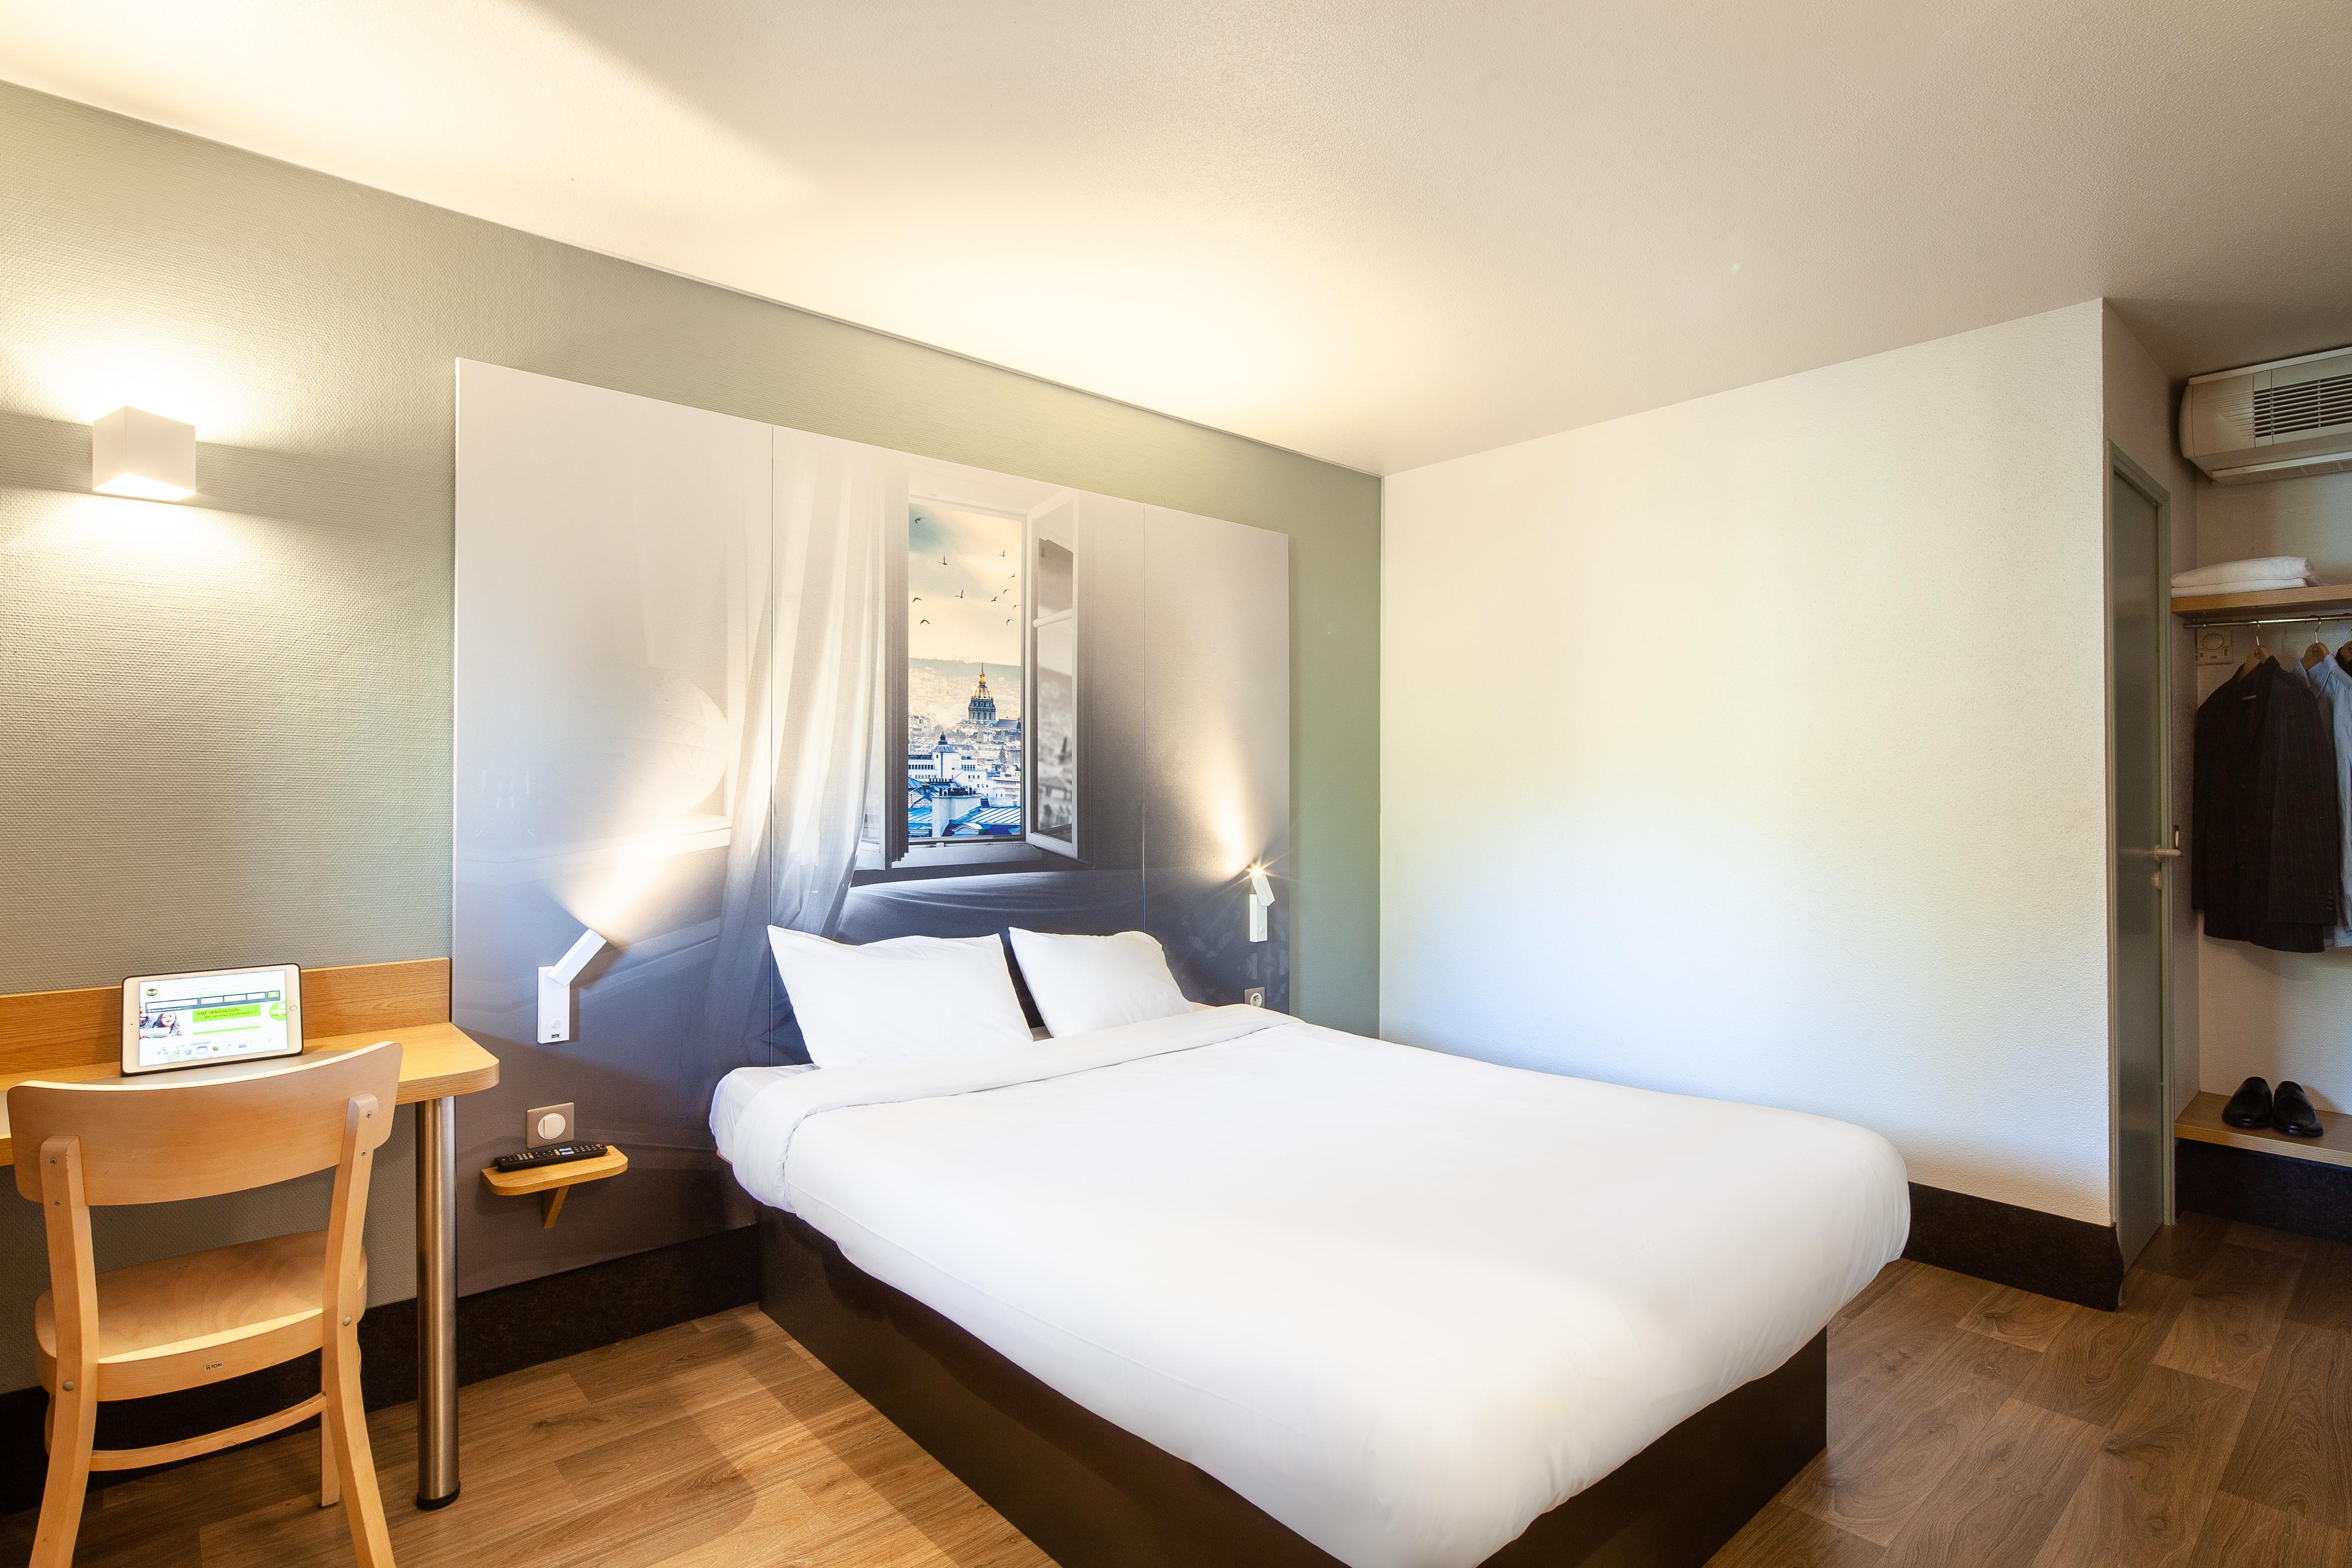 B&B Hôtel PONTAULT-COMBAULT